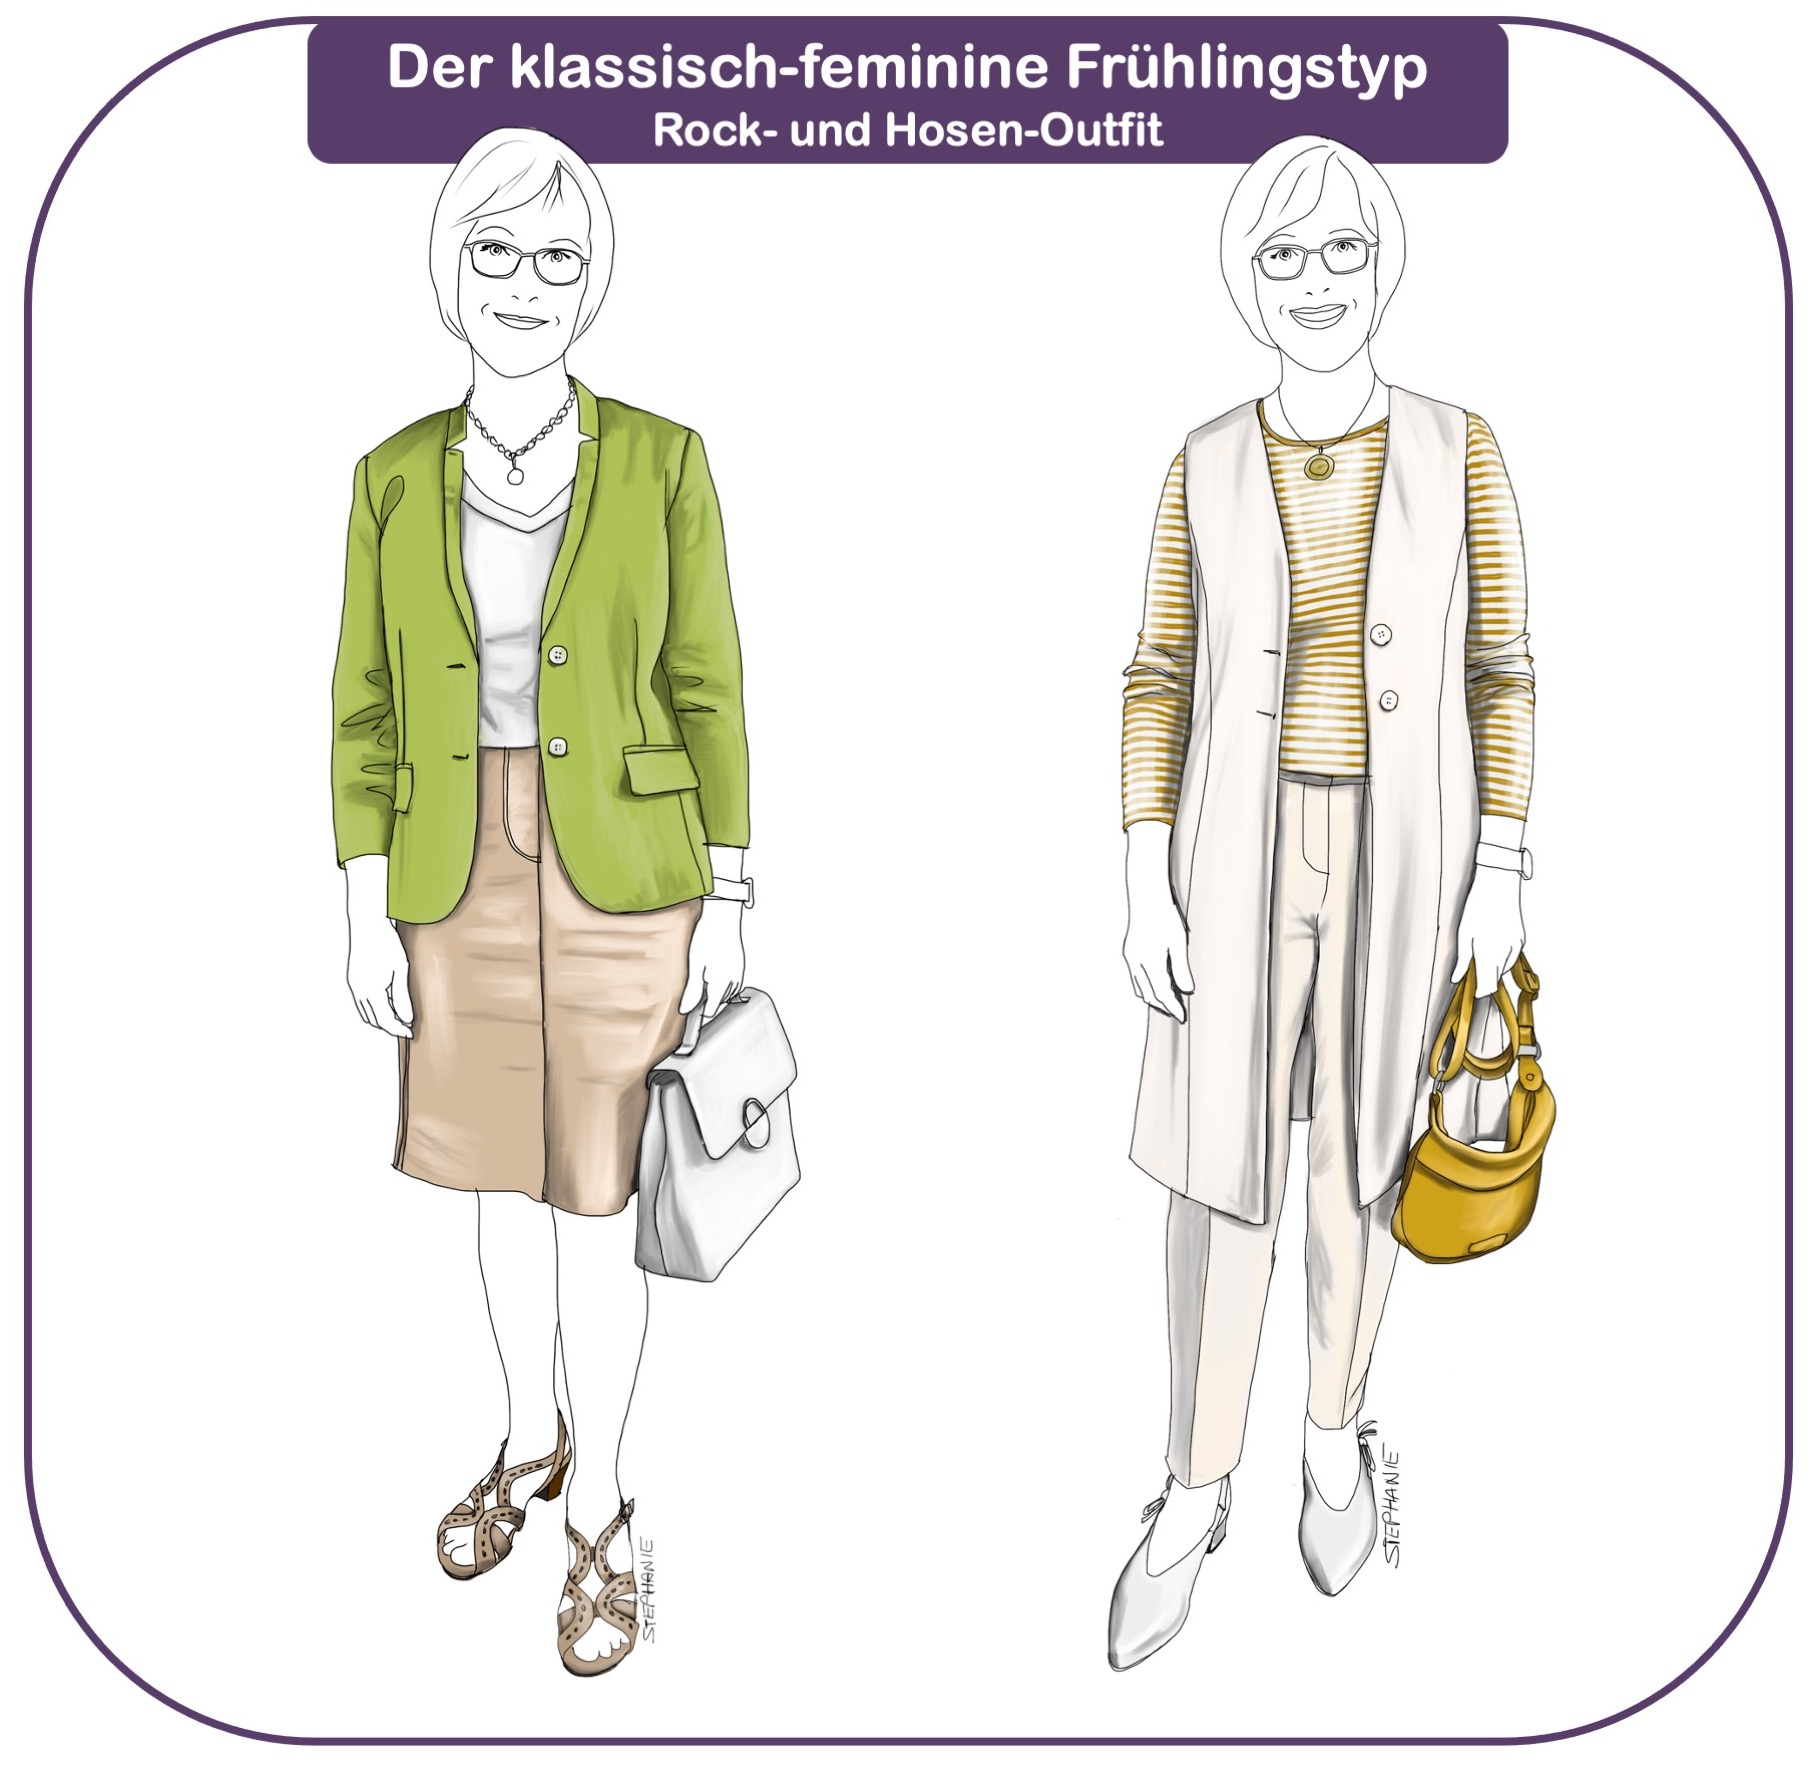 klassisch-femininer Frühlingstyp: zwei Outfits